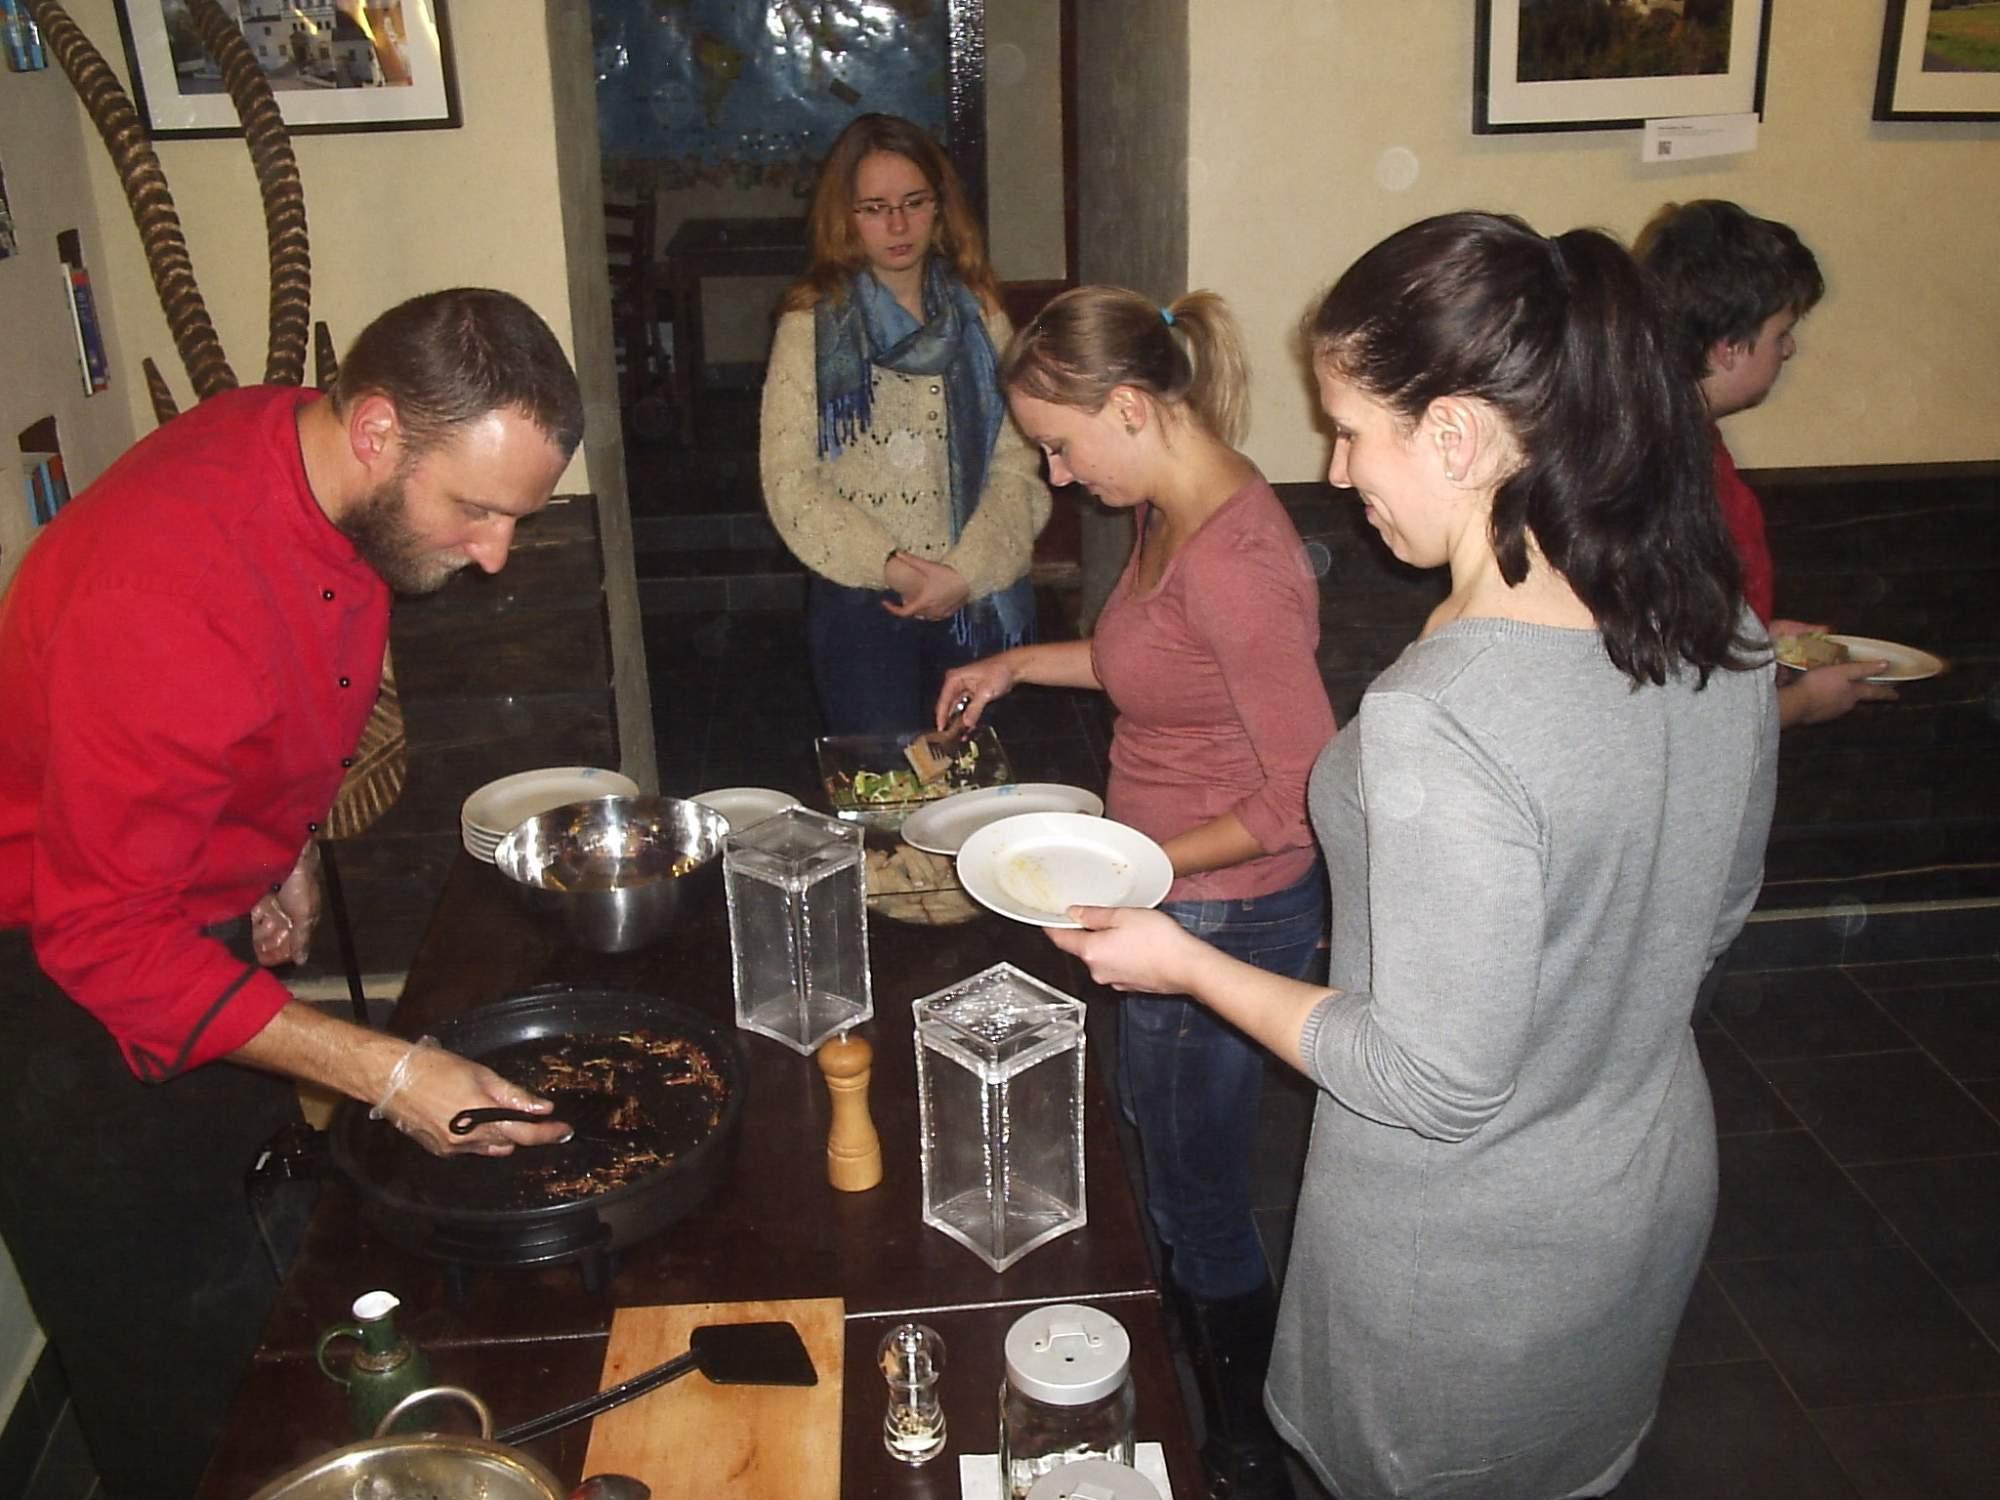 Sarančata všežravá podávaná k degustaci